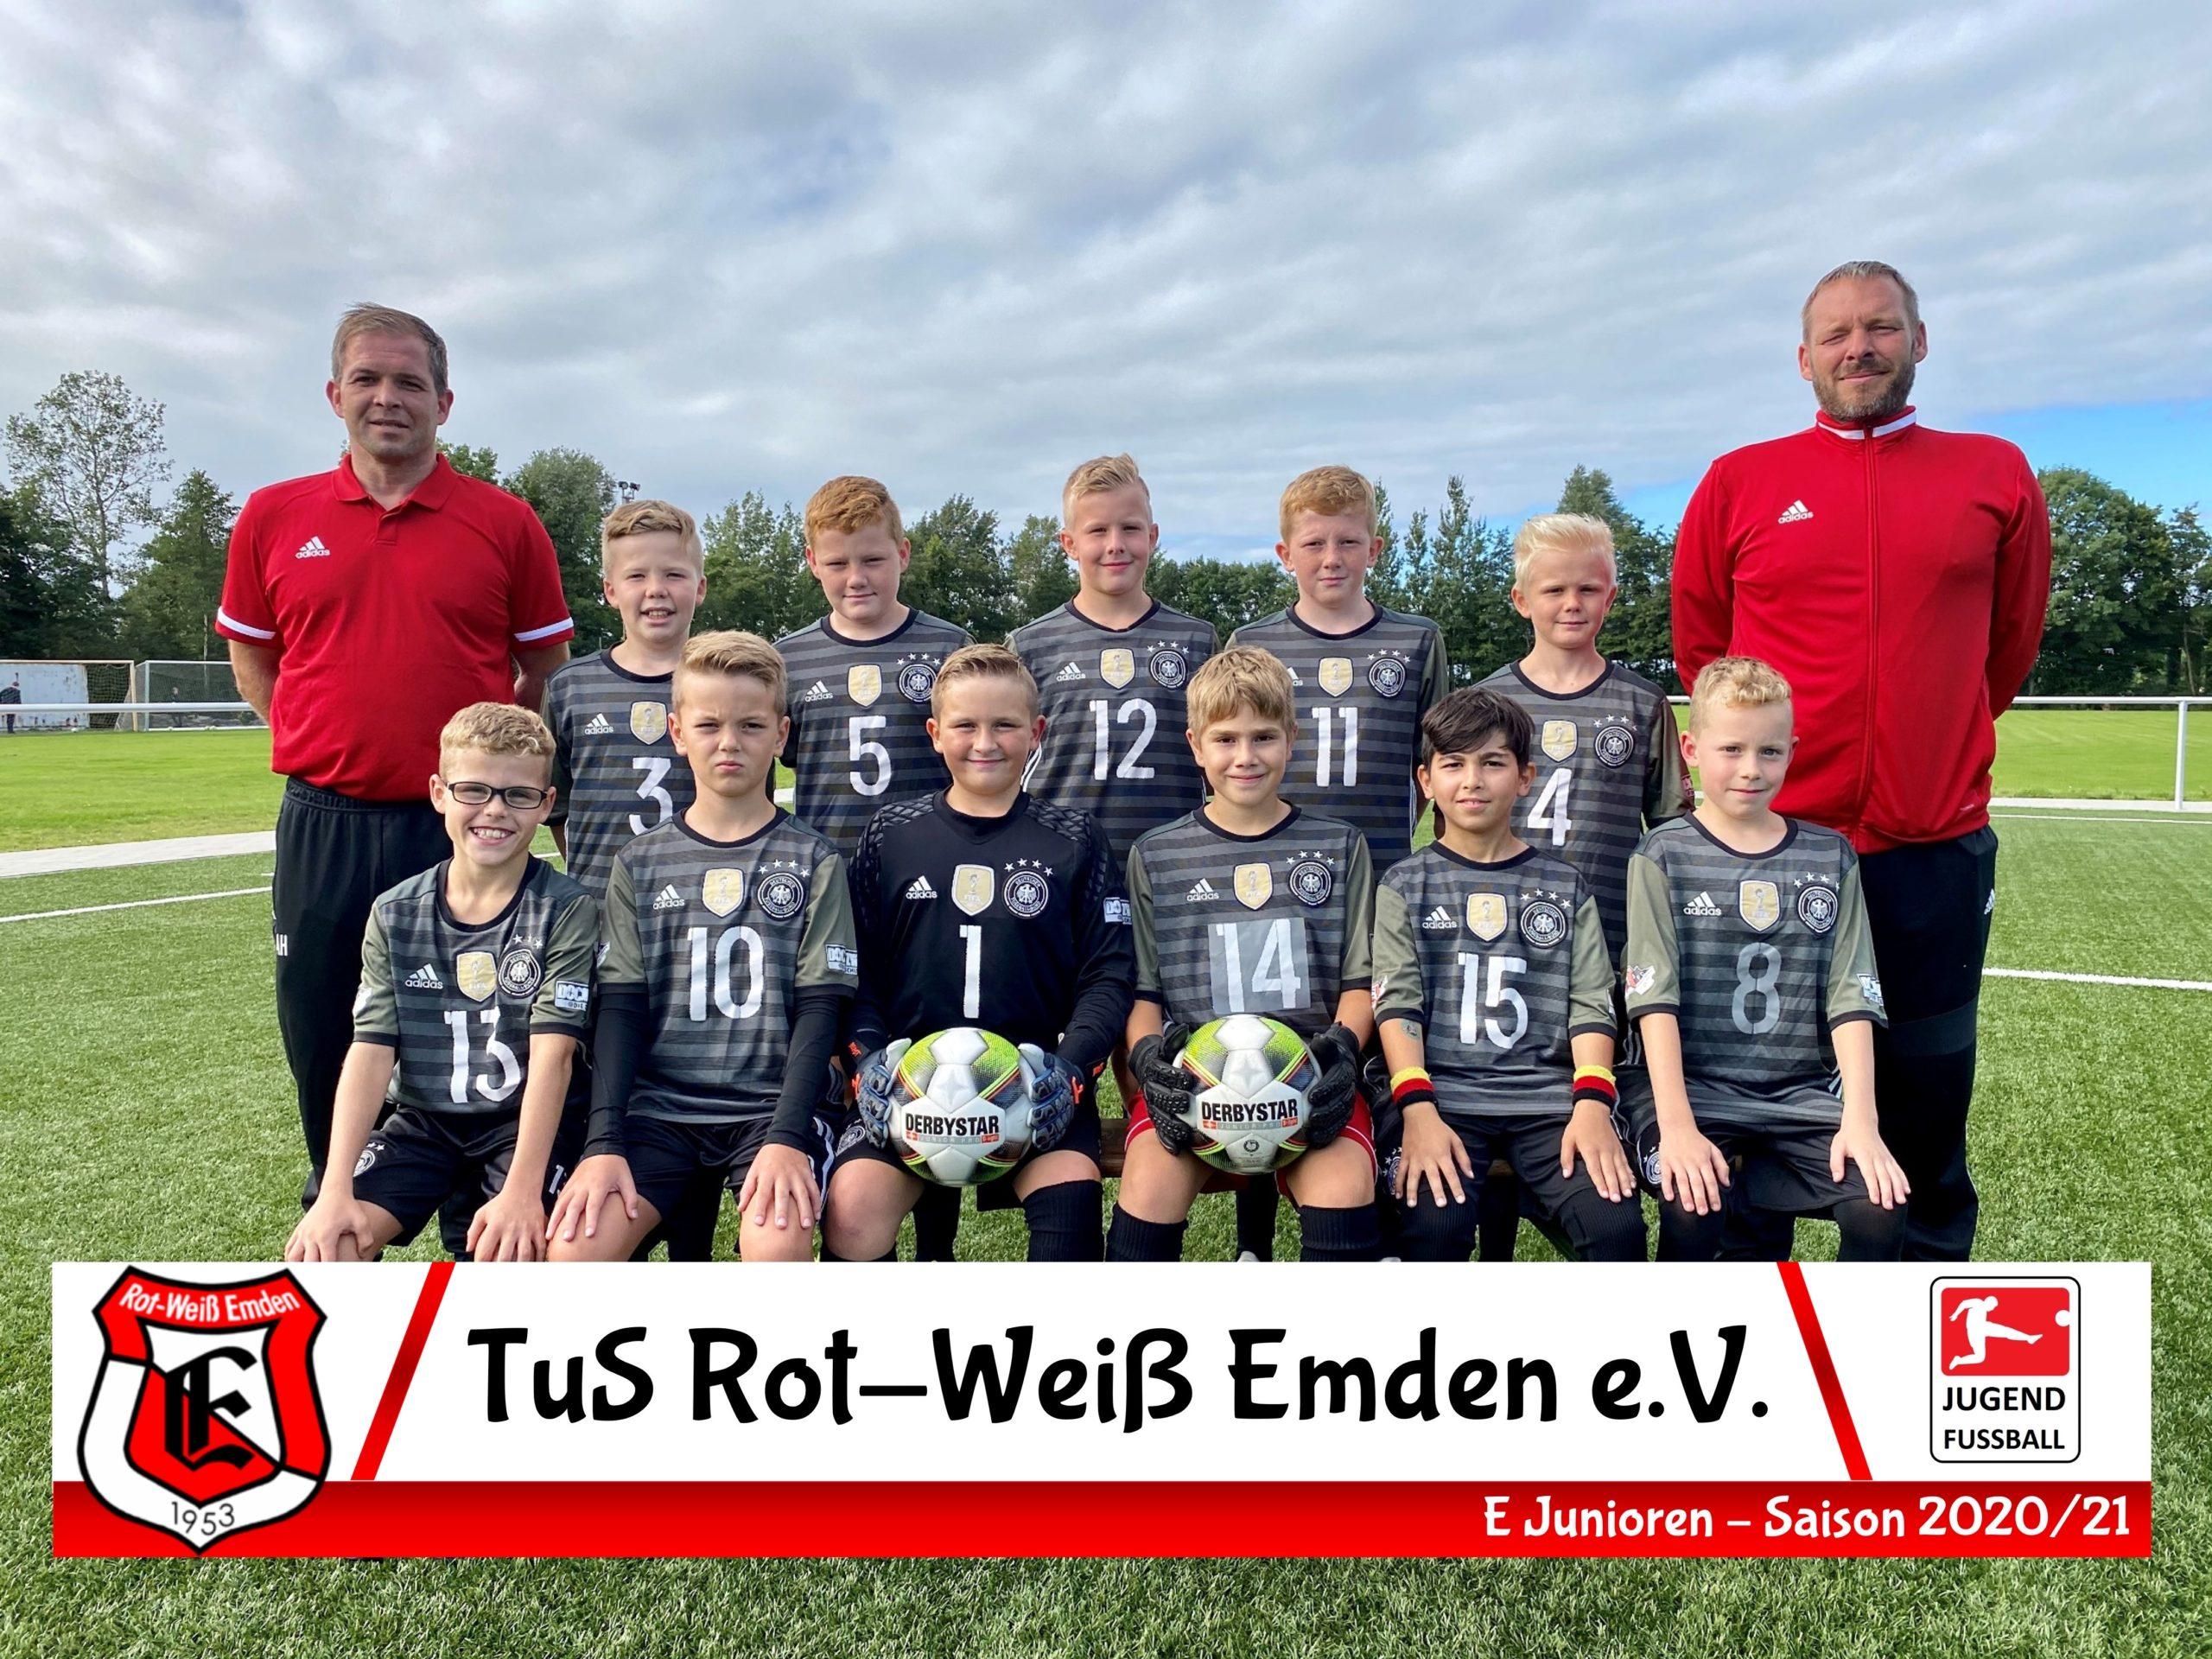 Mannschaftsfoto TuS Rot-Weiß Emden E1-Junioren Saison 20/21